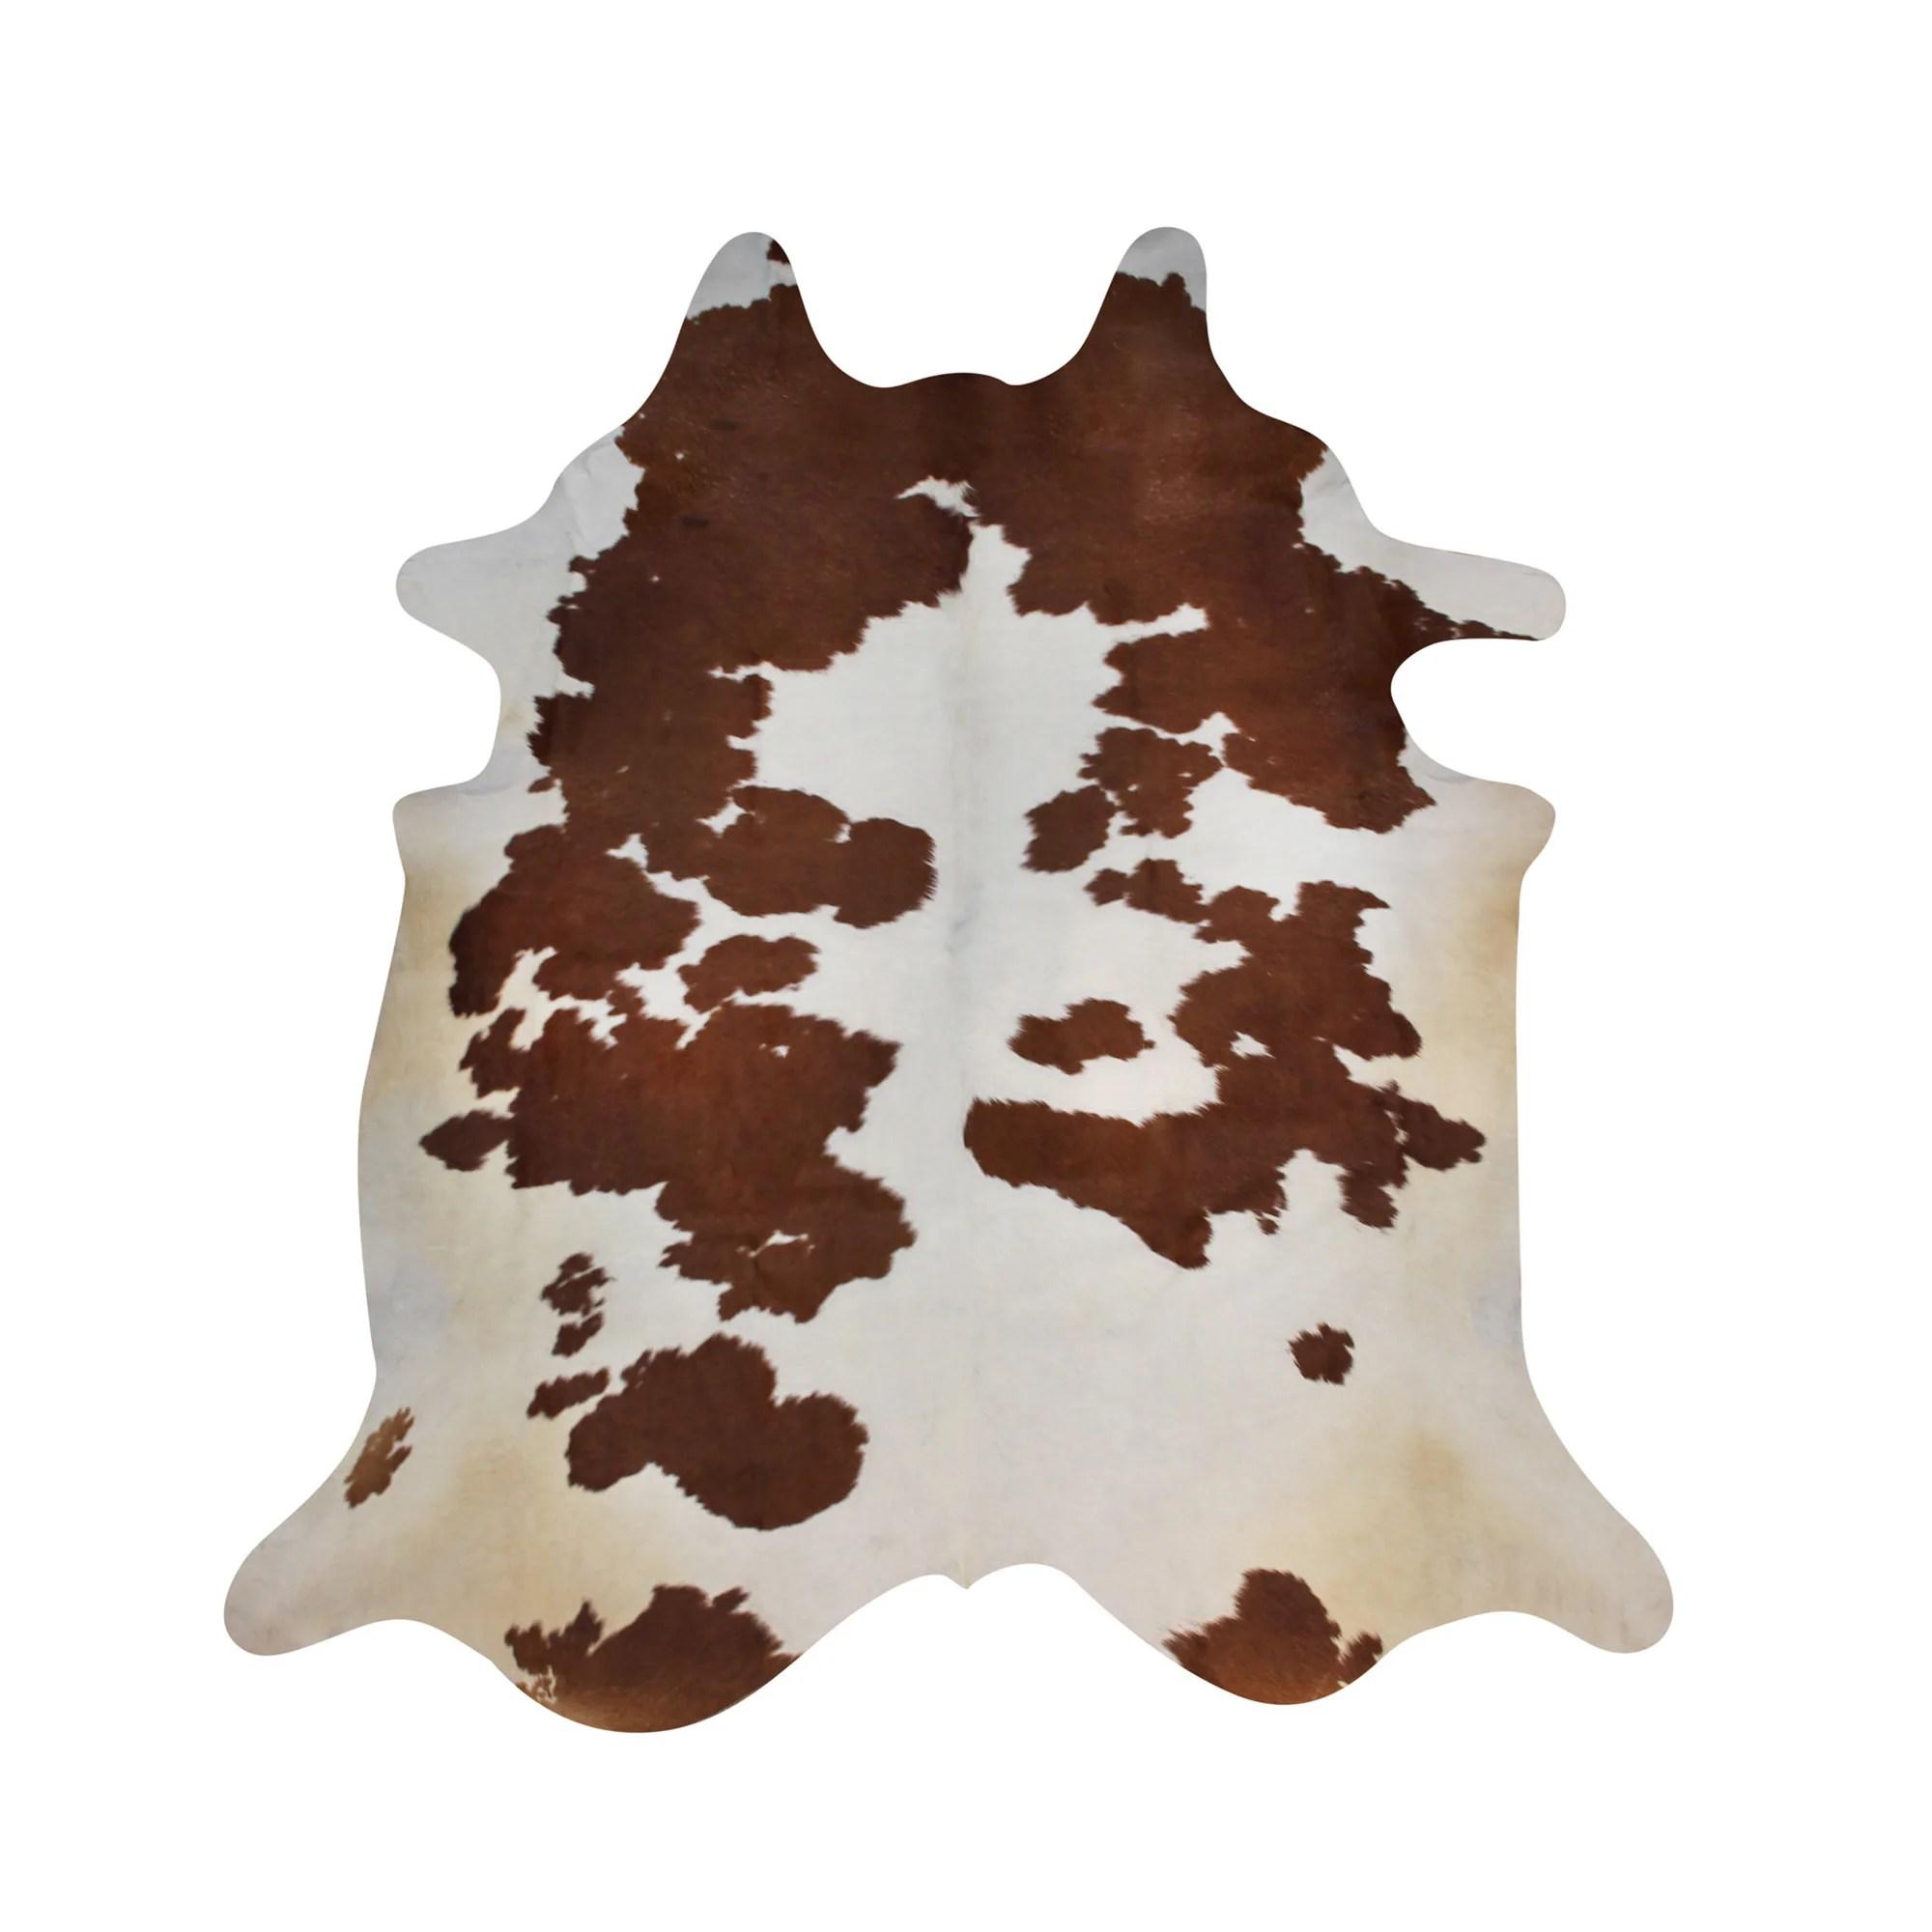 Brown And White Cowhide Rug Handpicked Natural Cowhide